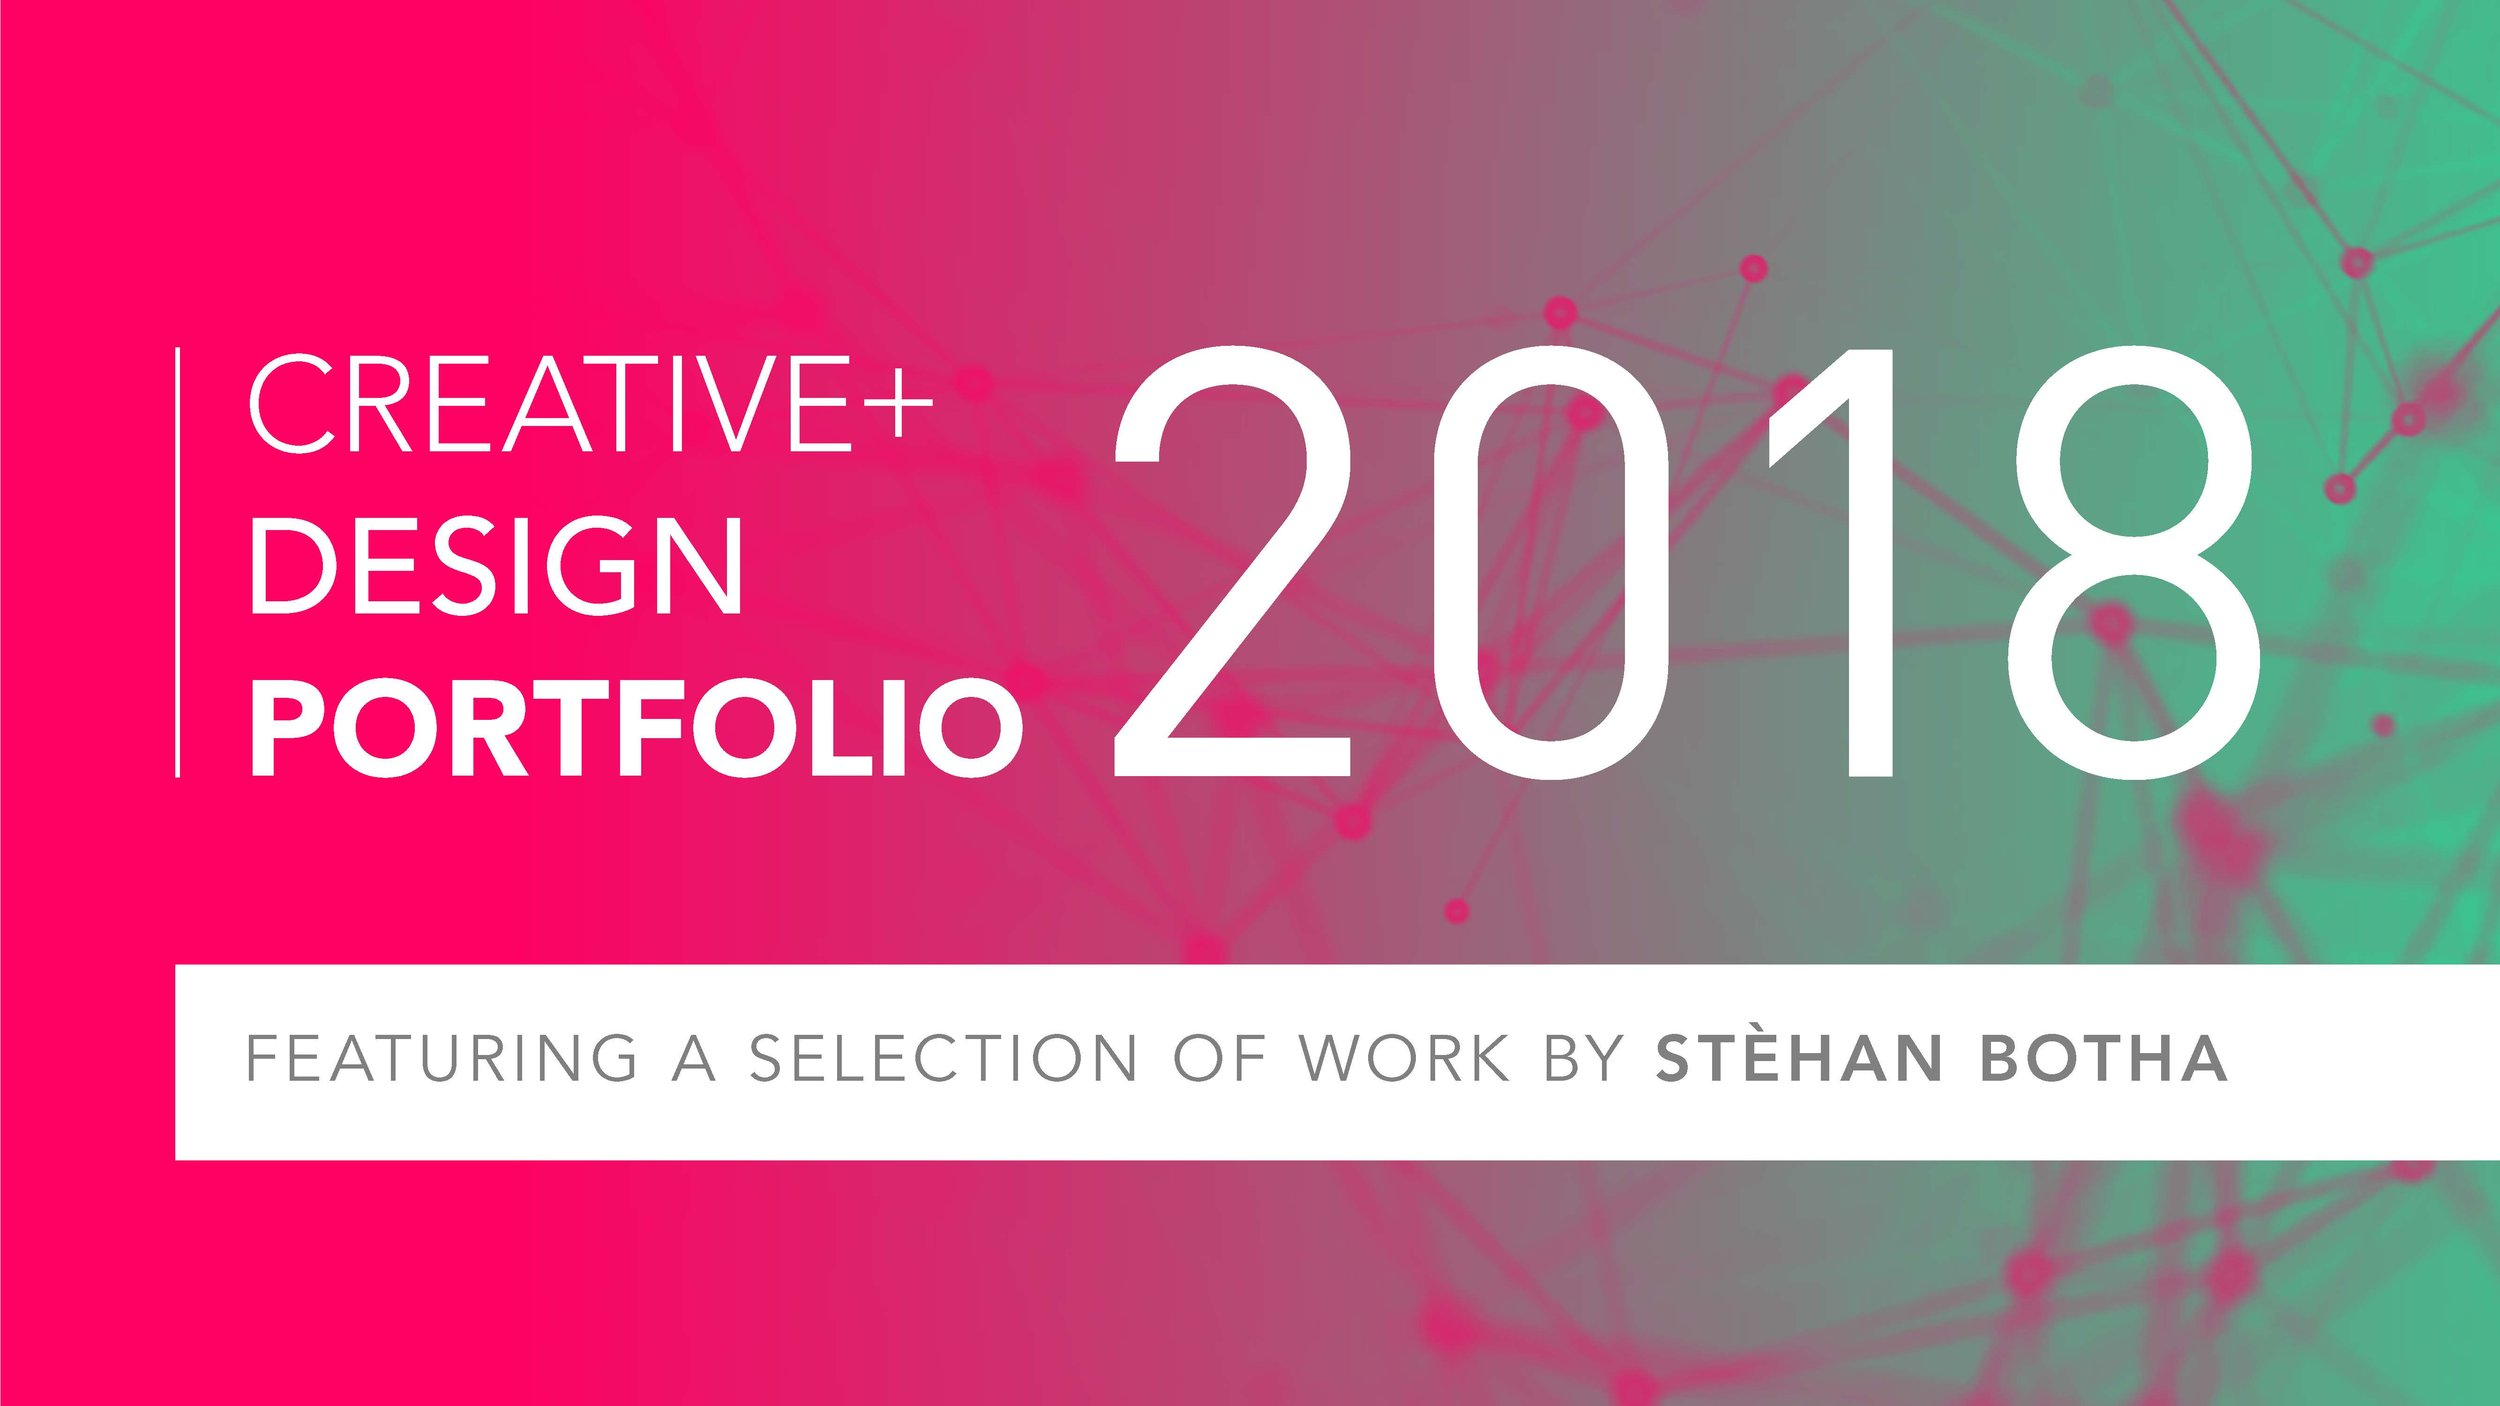 DESIGN PORTFOLIO of SteHan Botha 2018_Page_01.jpg